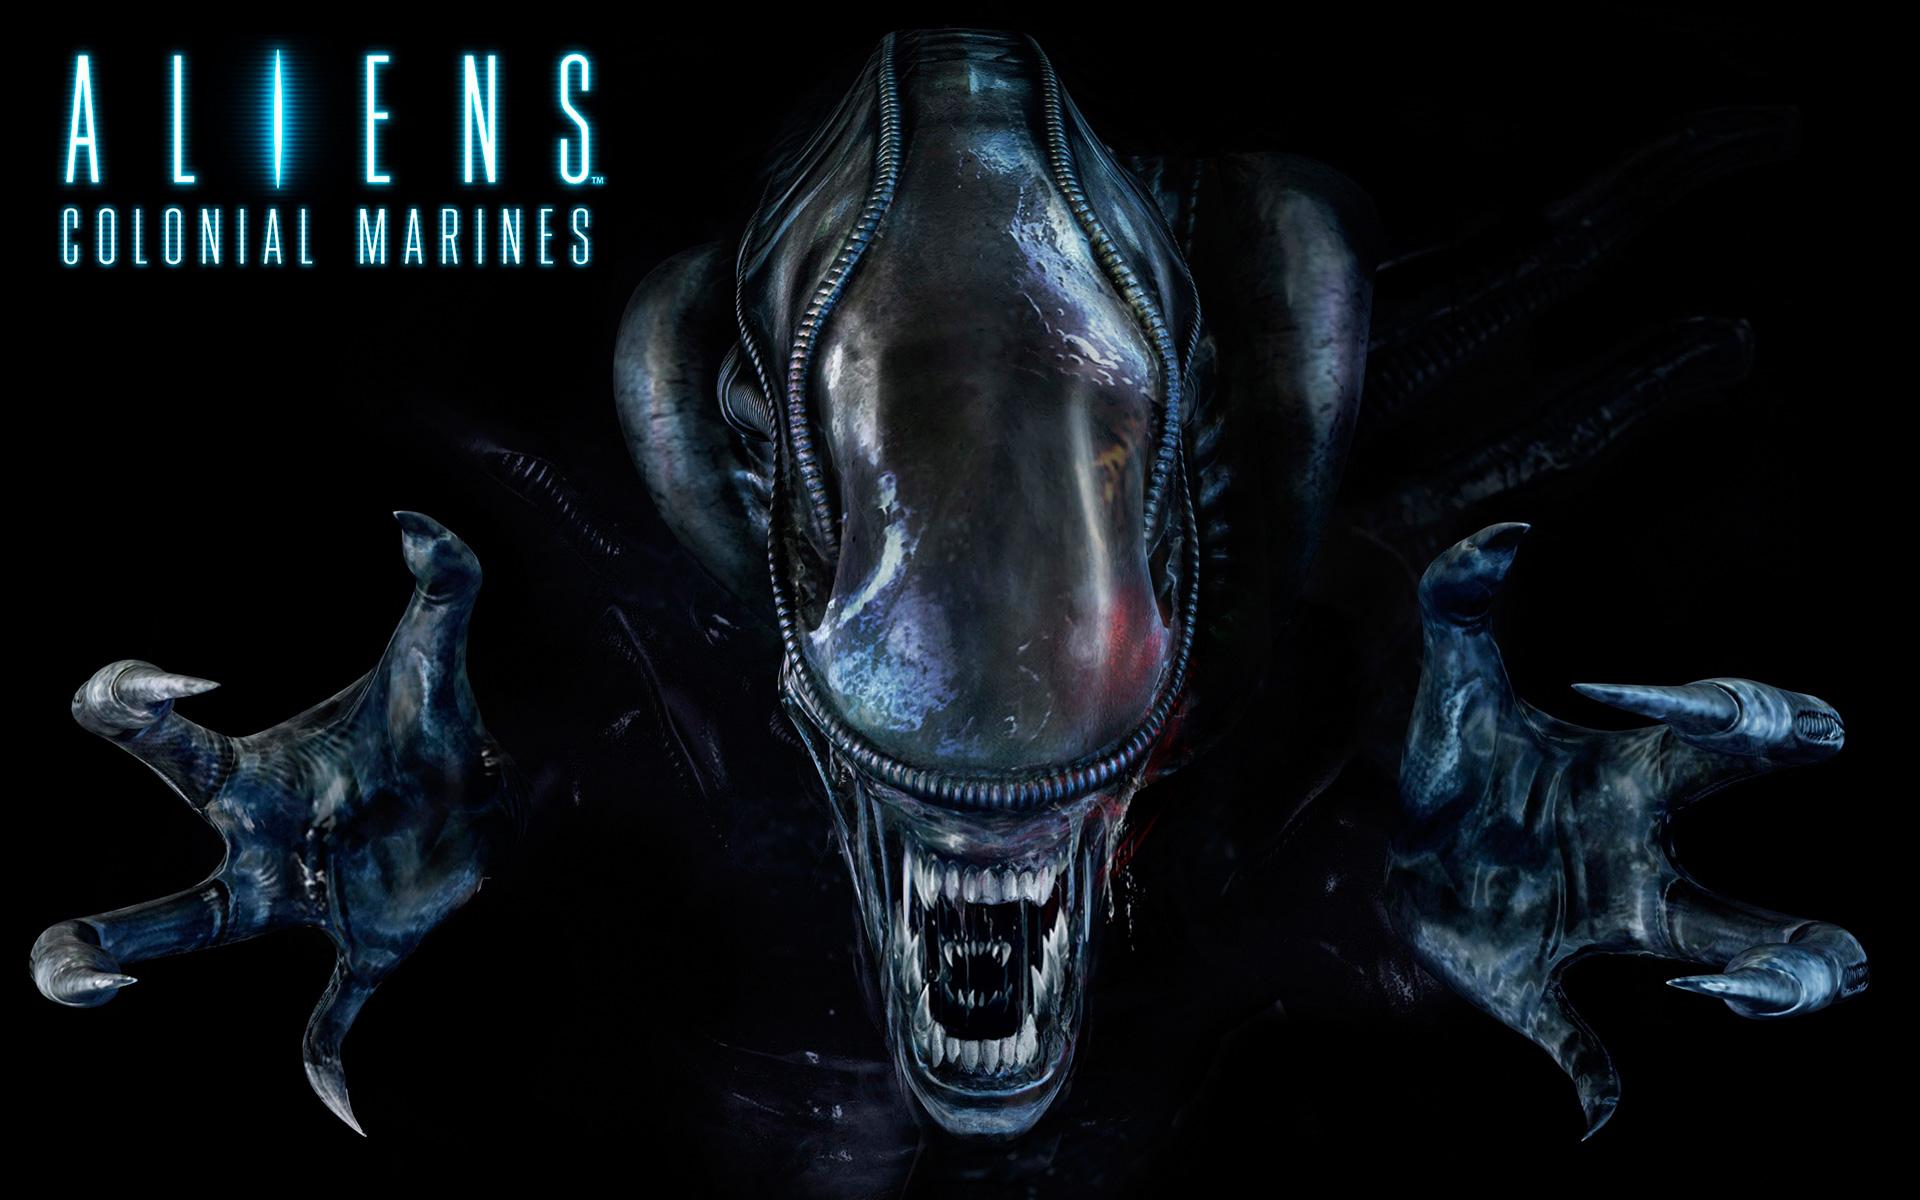 Aliens Colonial Marines Wallpaper in 1920x1200 1920x1200